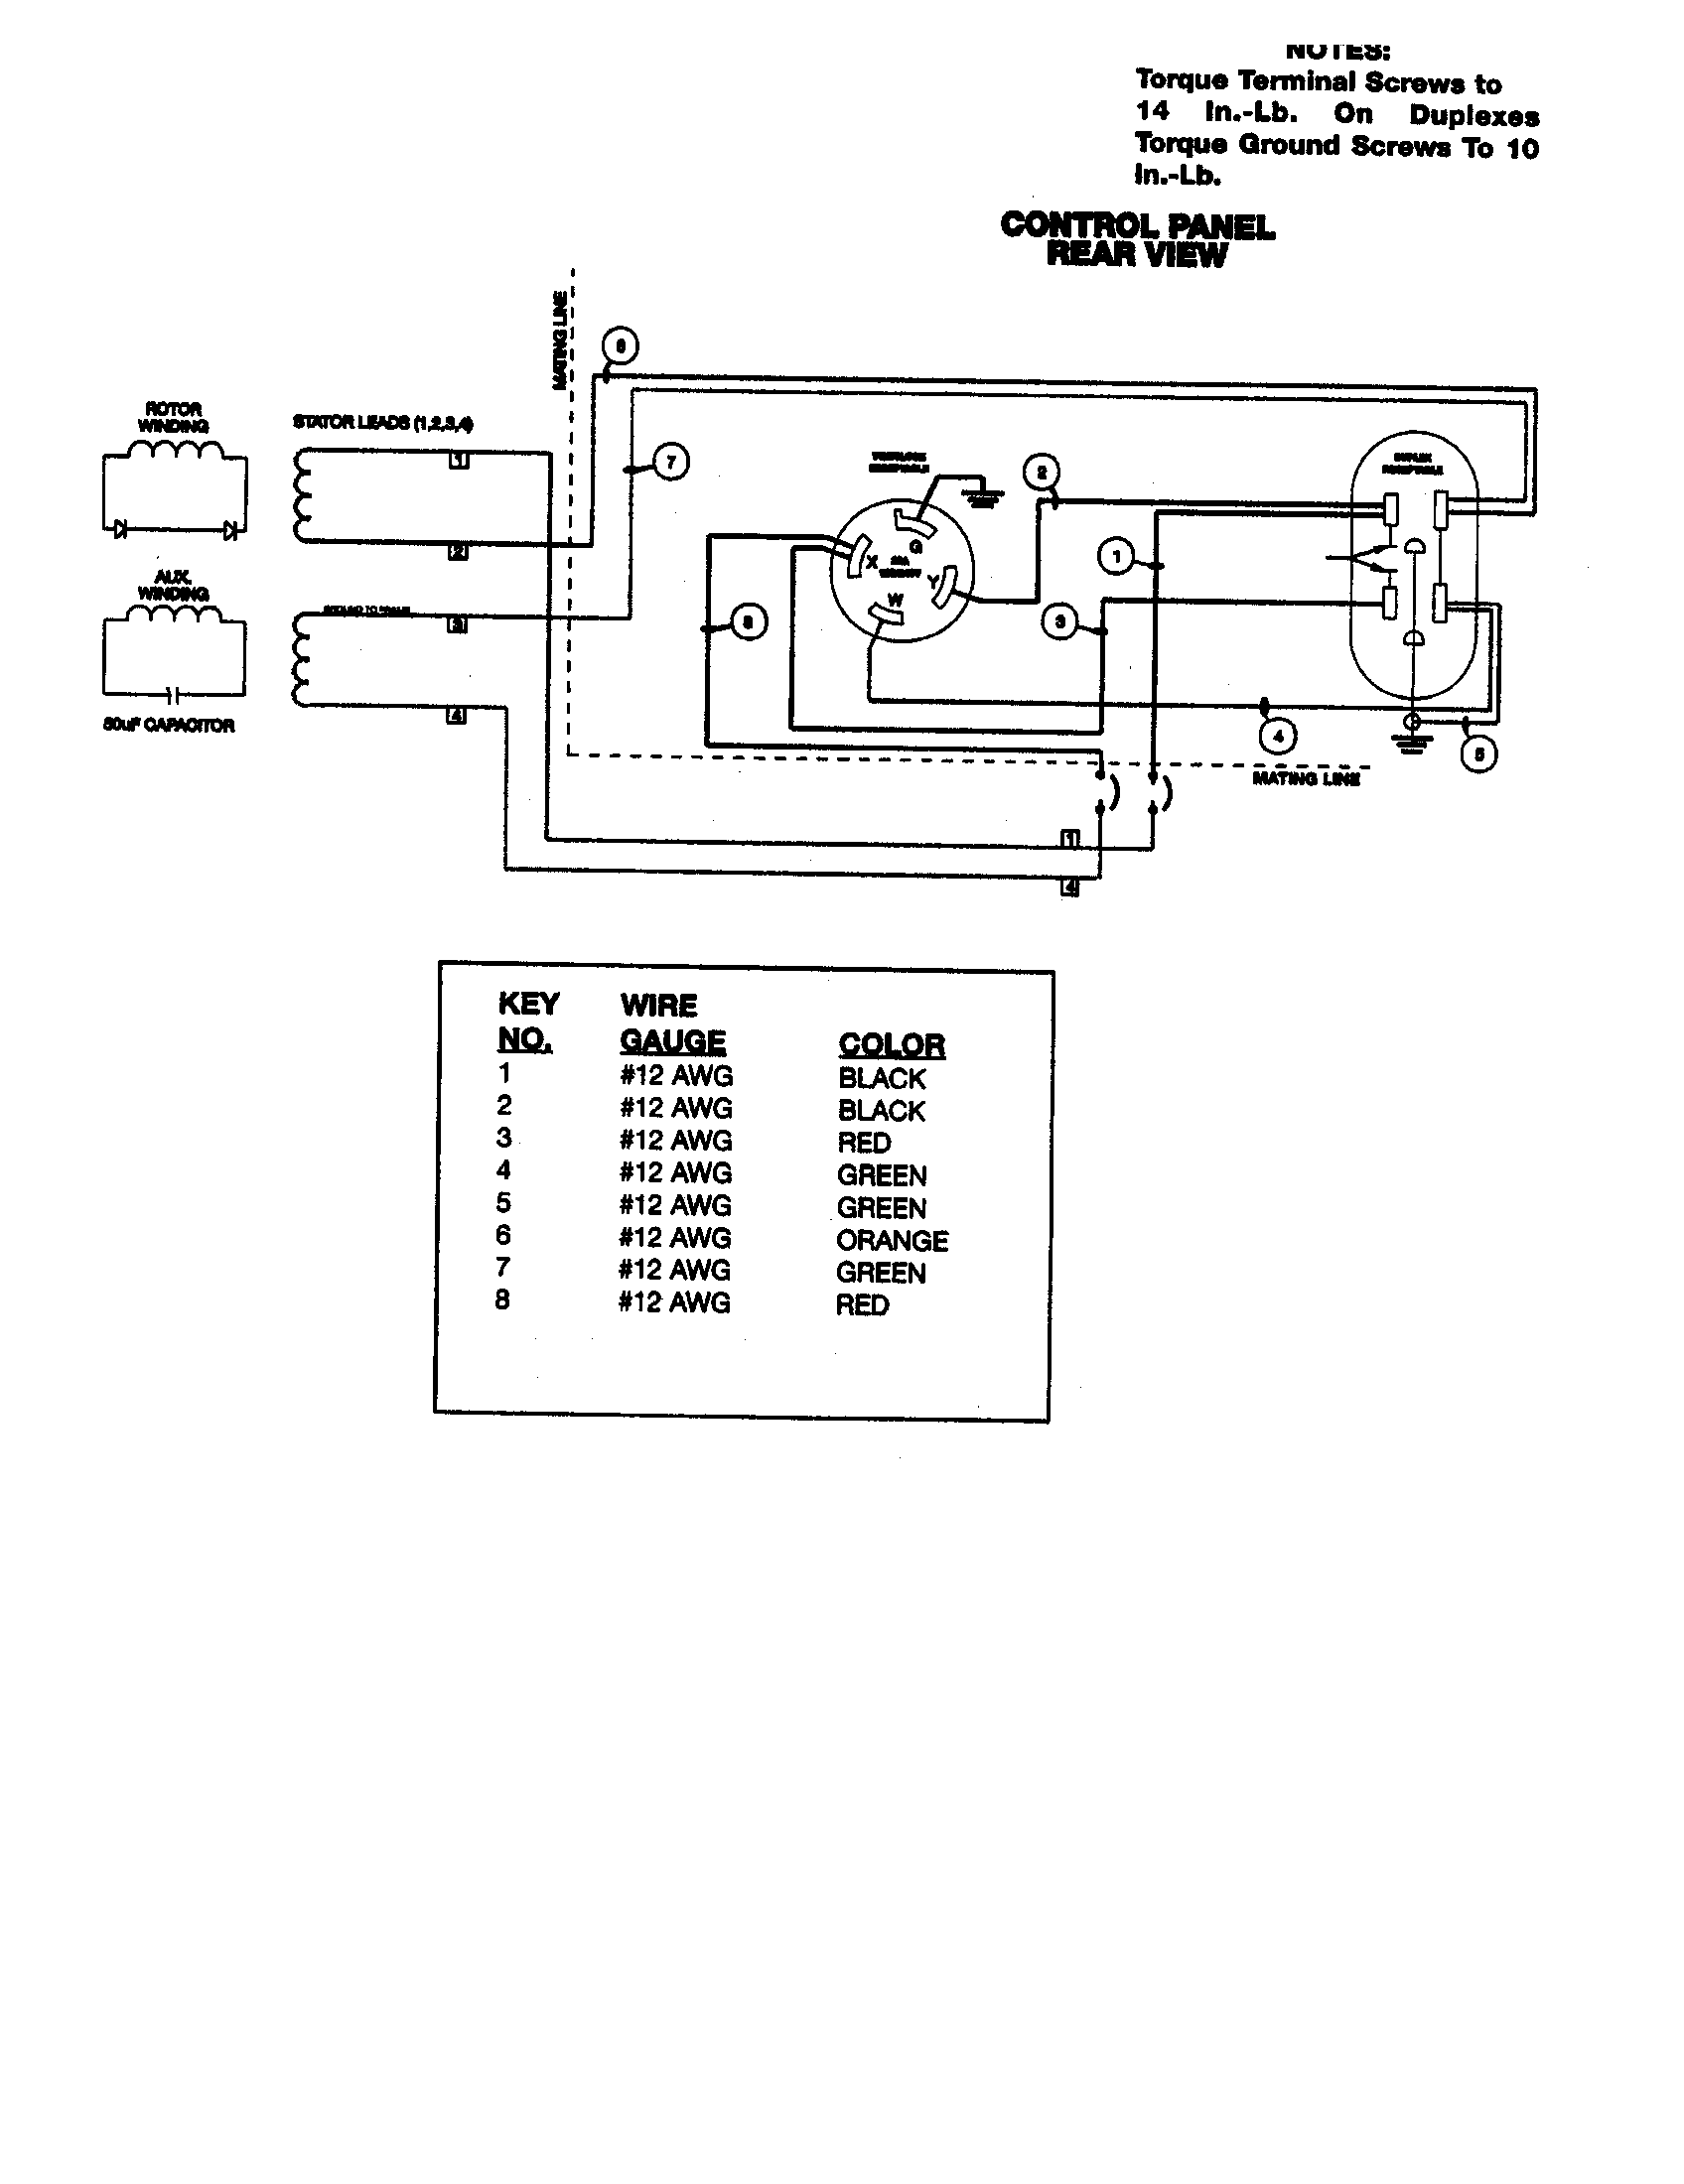 Brake Lathe Wiring Diagramhtml Auto Electrical Diagram Devilbiss 24 Images